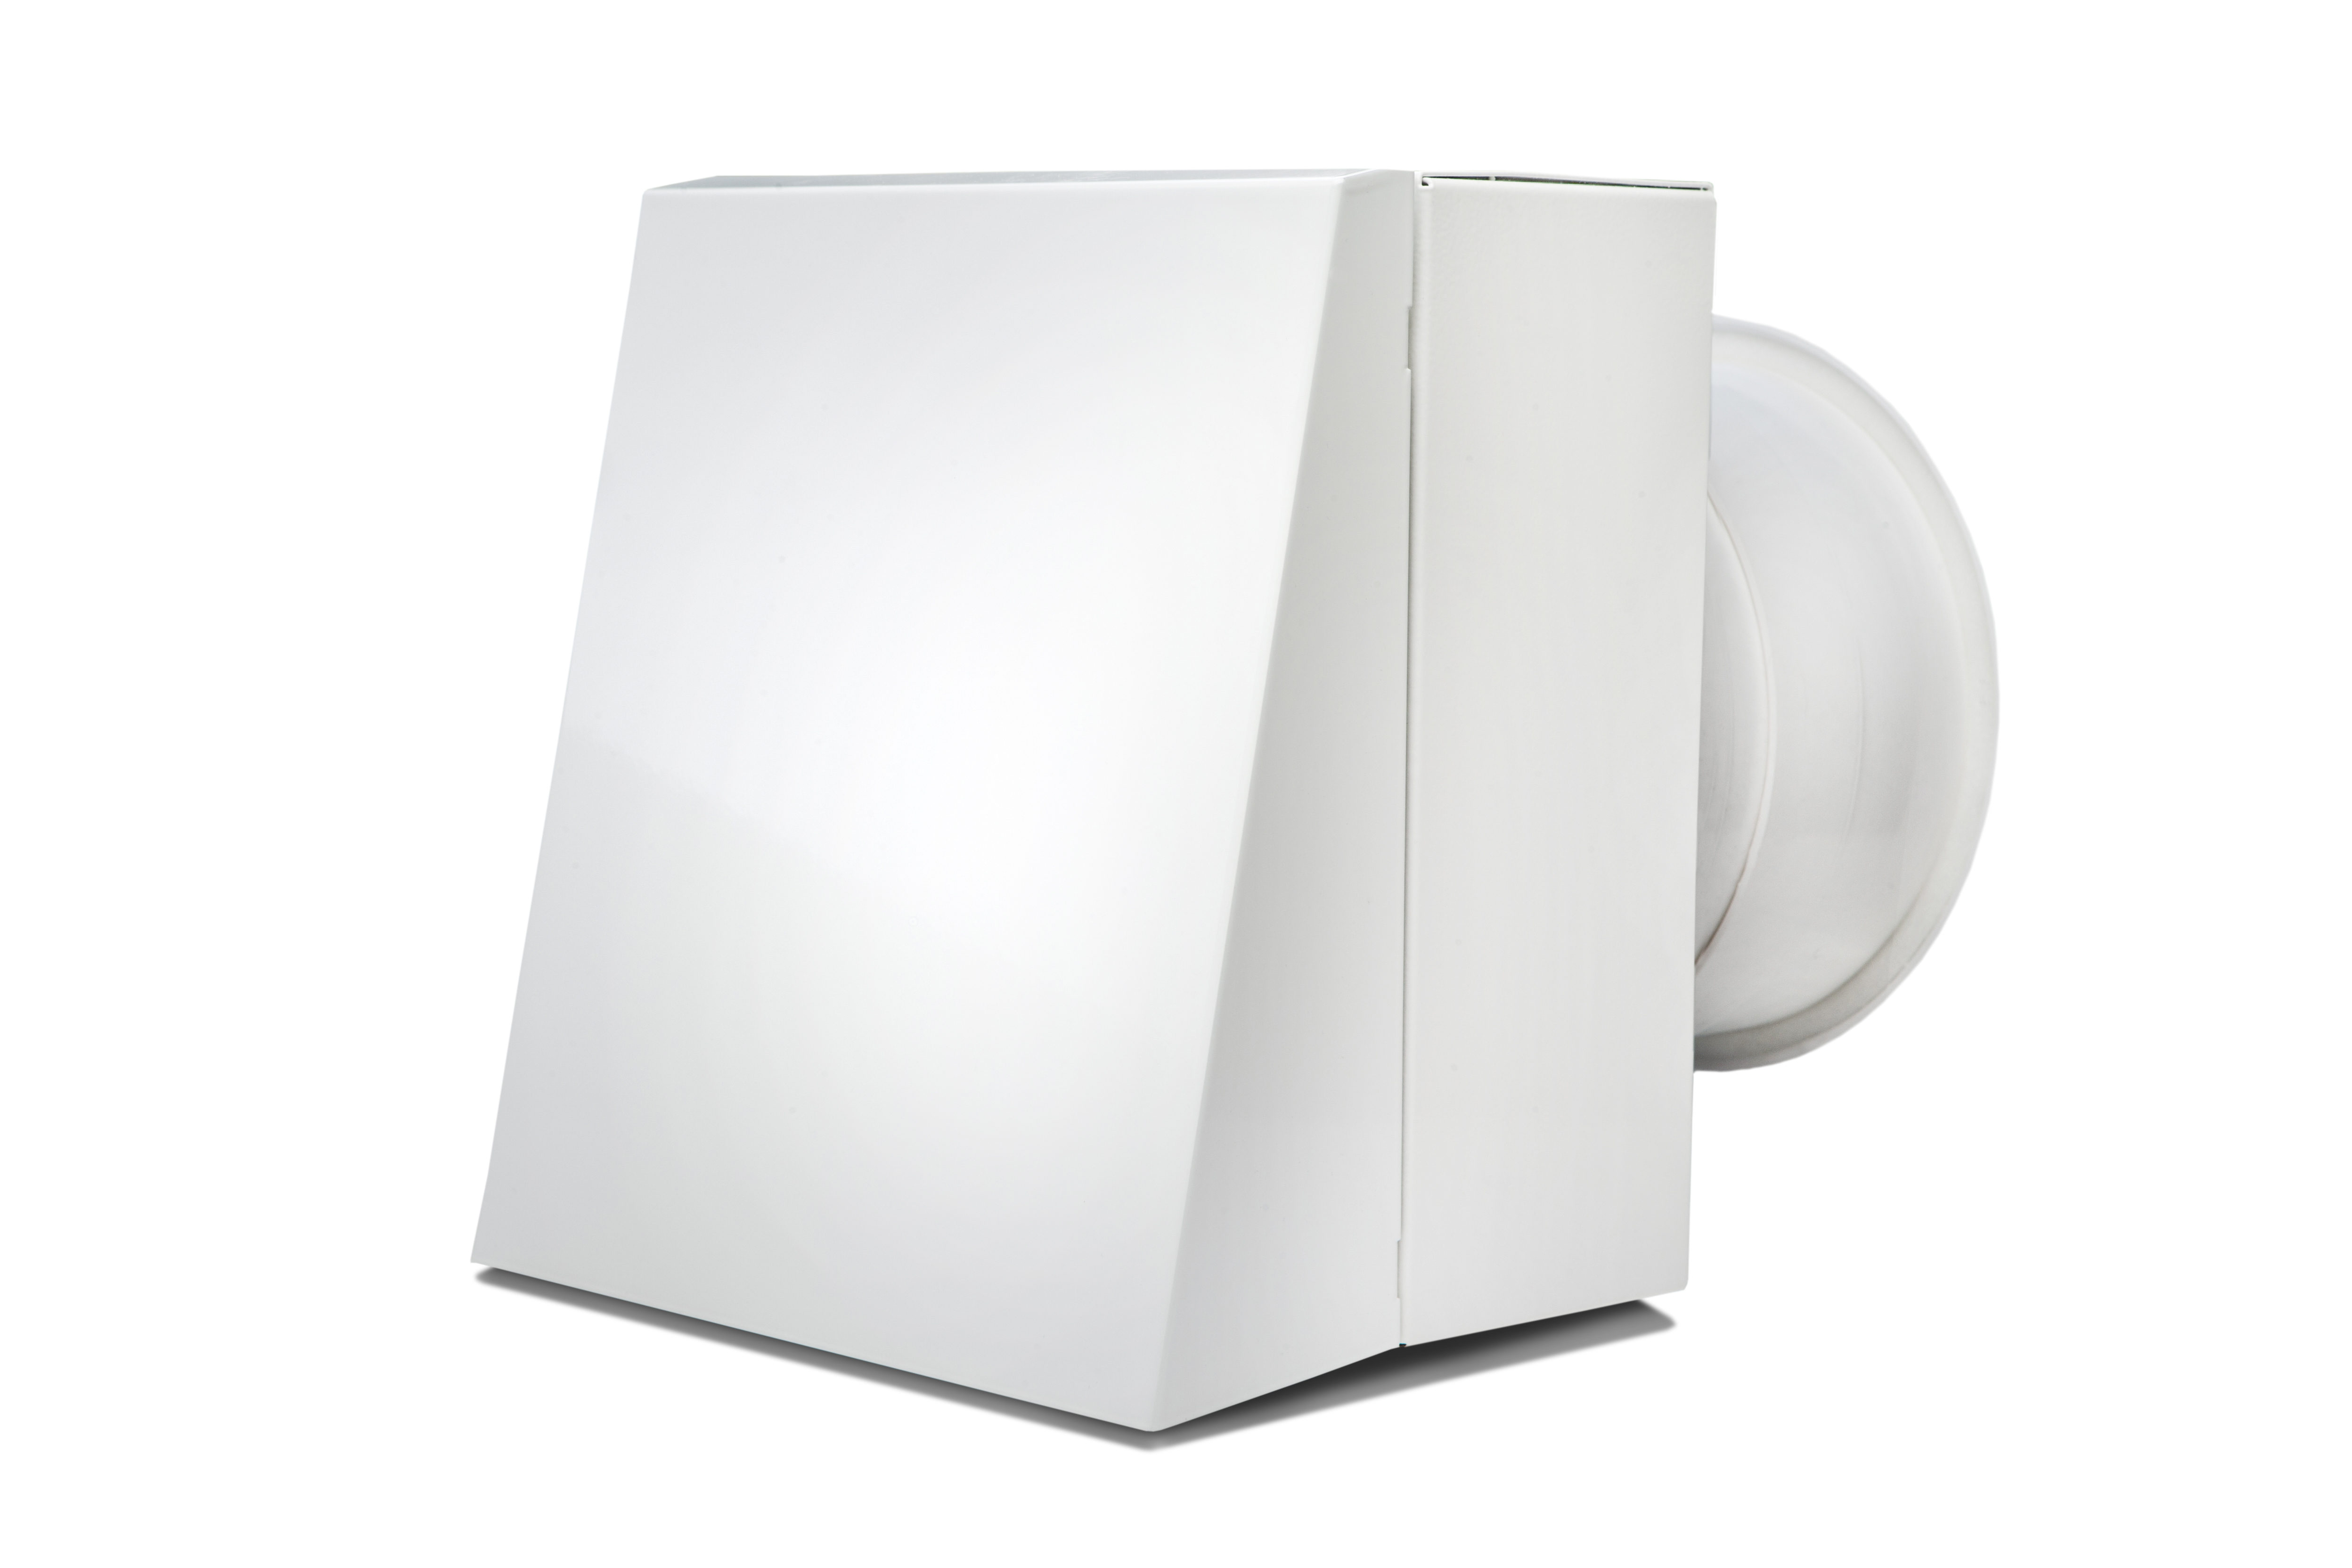 Рекуператор Ventoxx Slim Line c компенсационным коробом